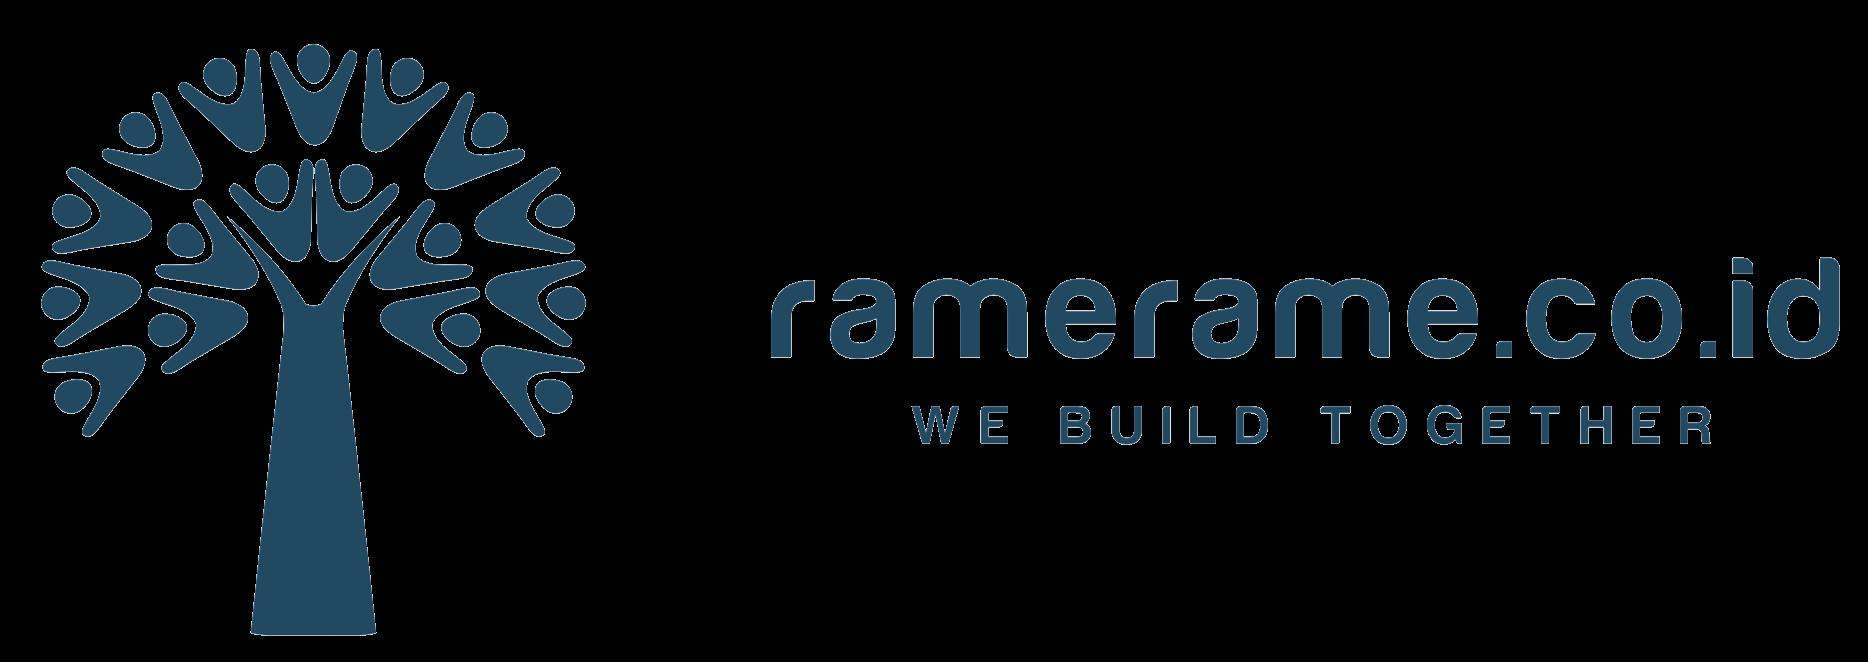 ramerame.co.id news